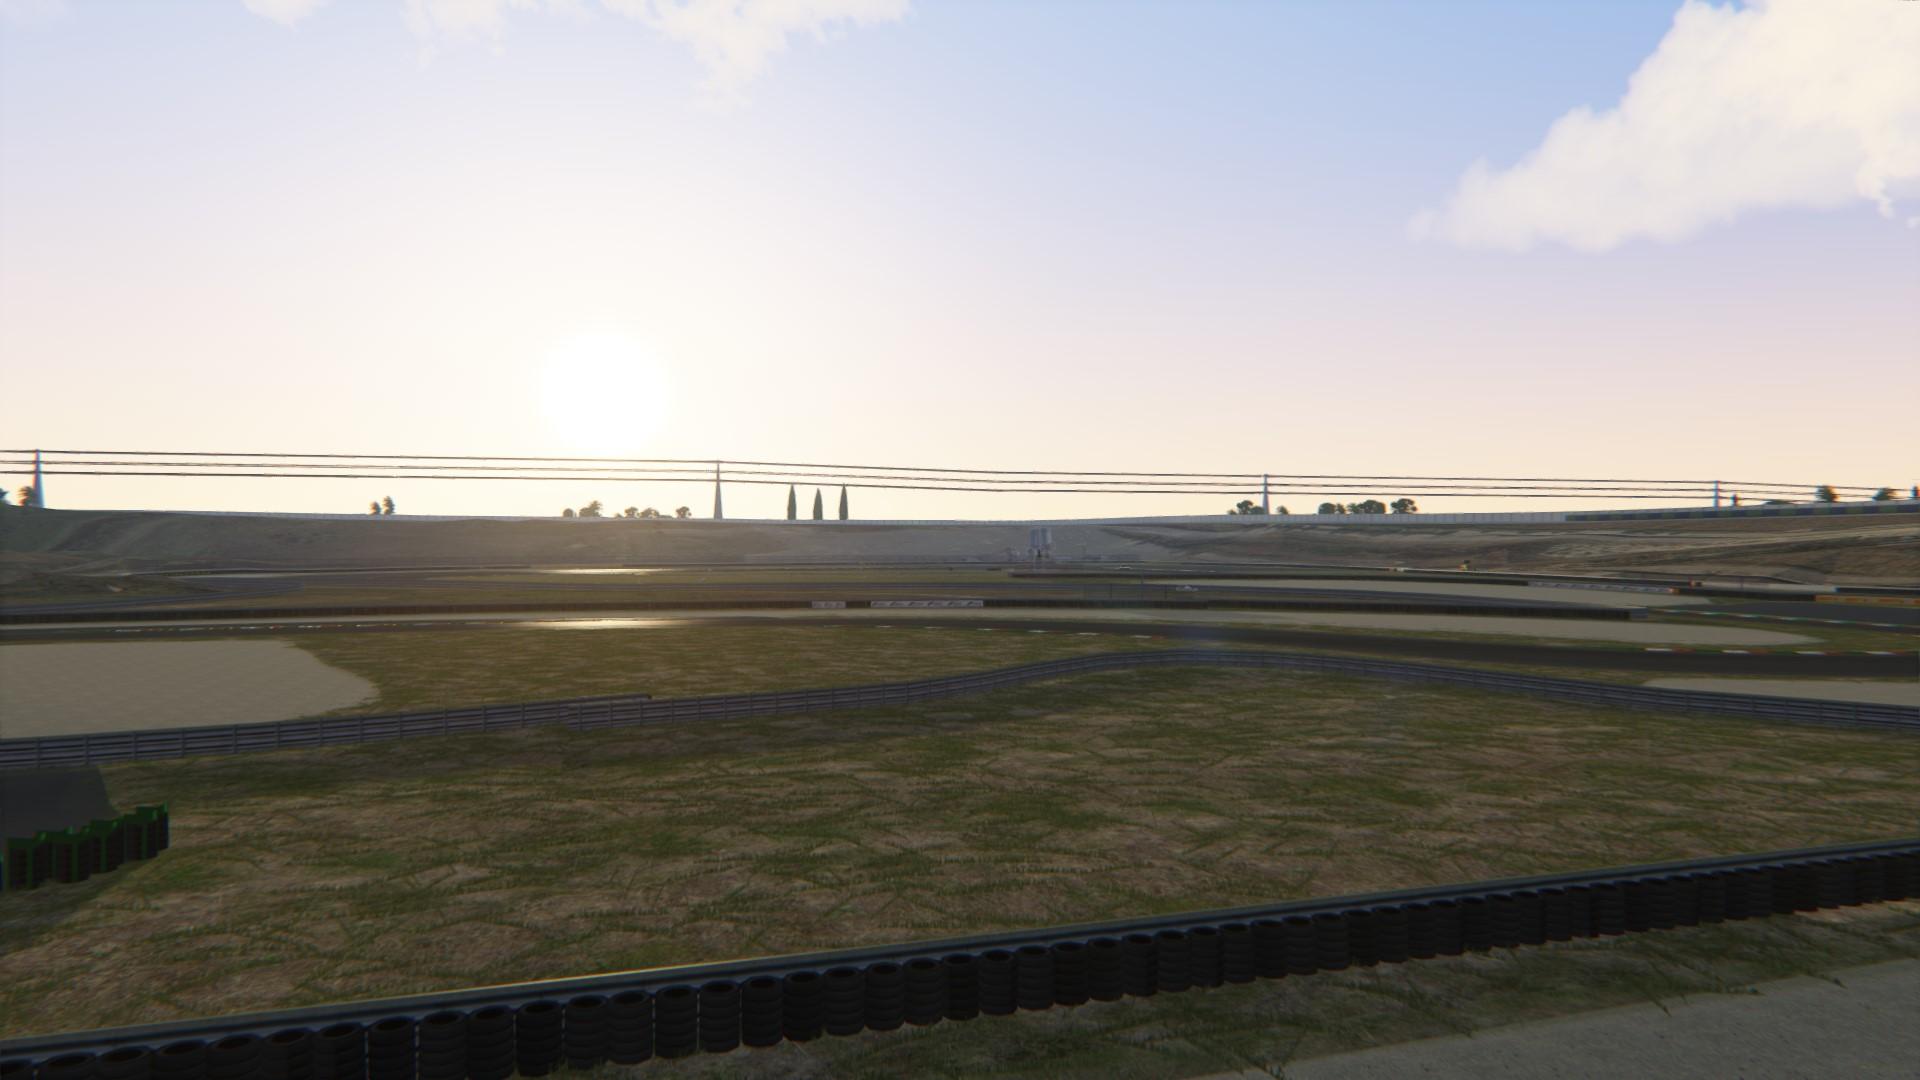 Screenshot_ks_toyota_ae86_autodromo_di_franciacorta_1-6-116-0-34-21.jpg